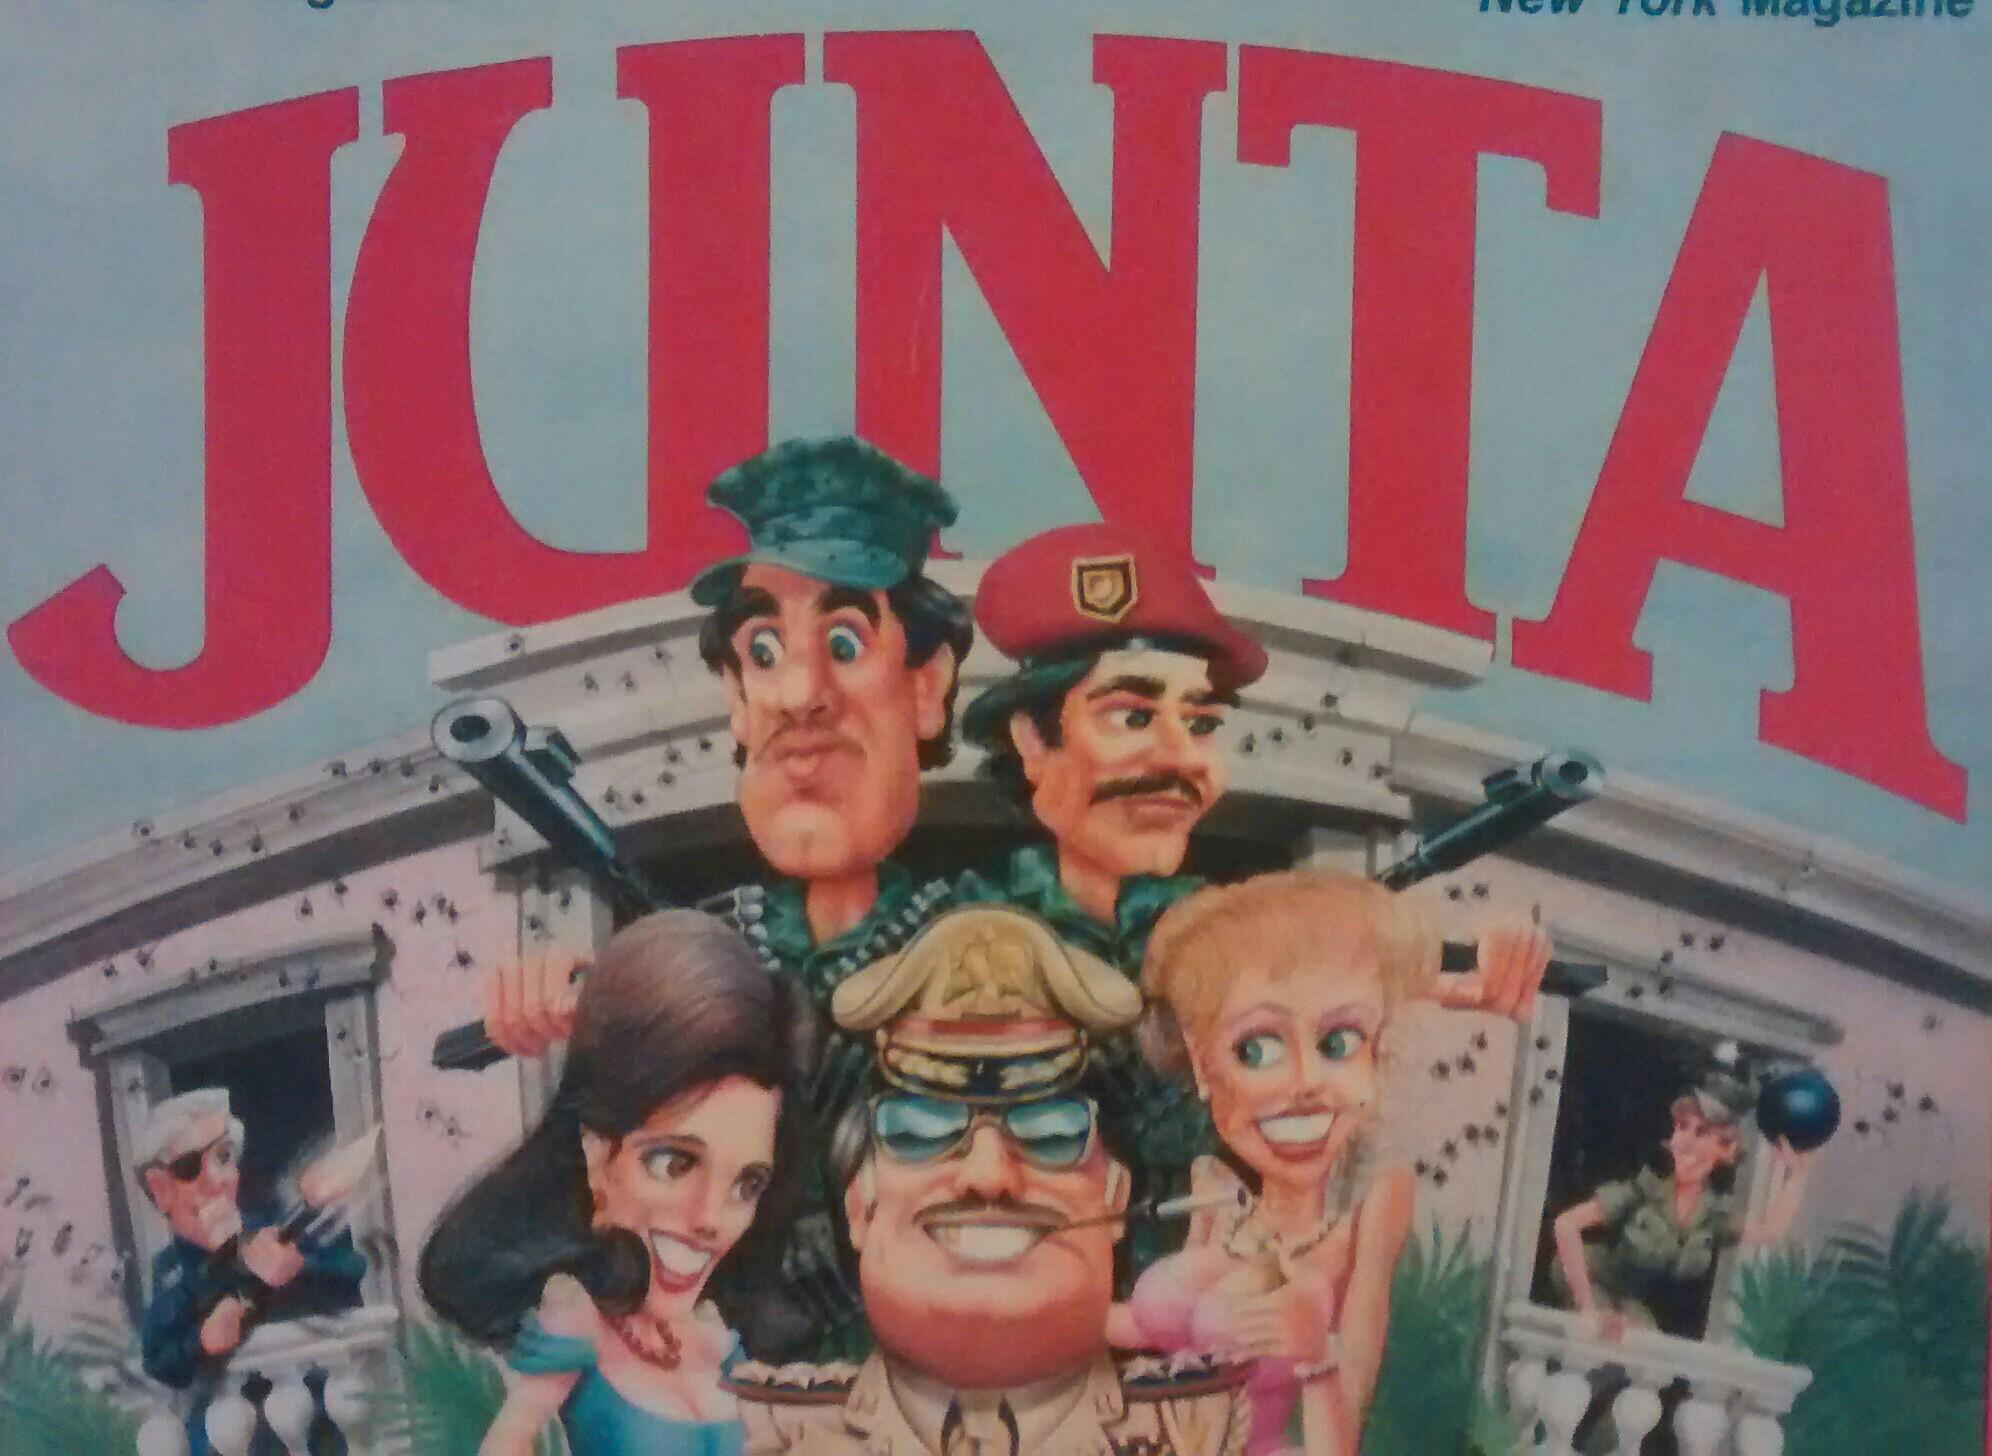 Junta : petites trahisons entre amis